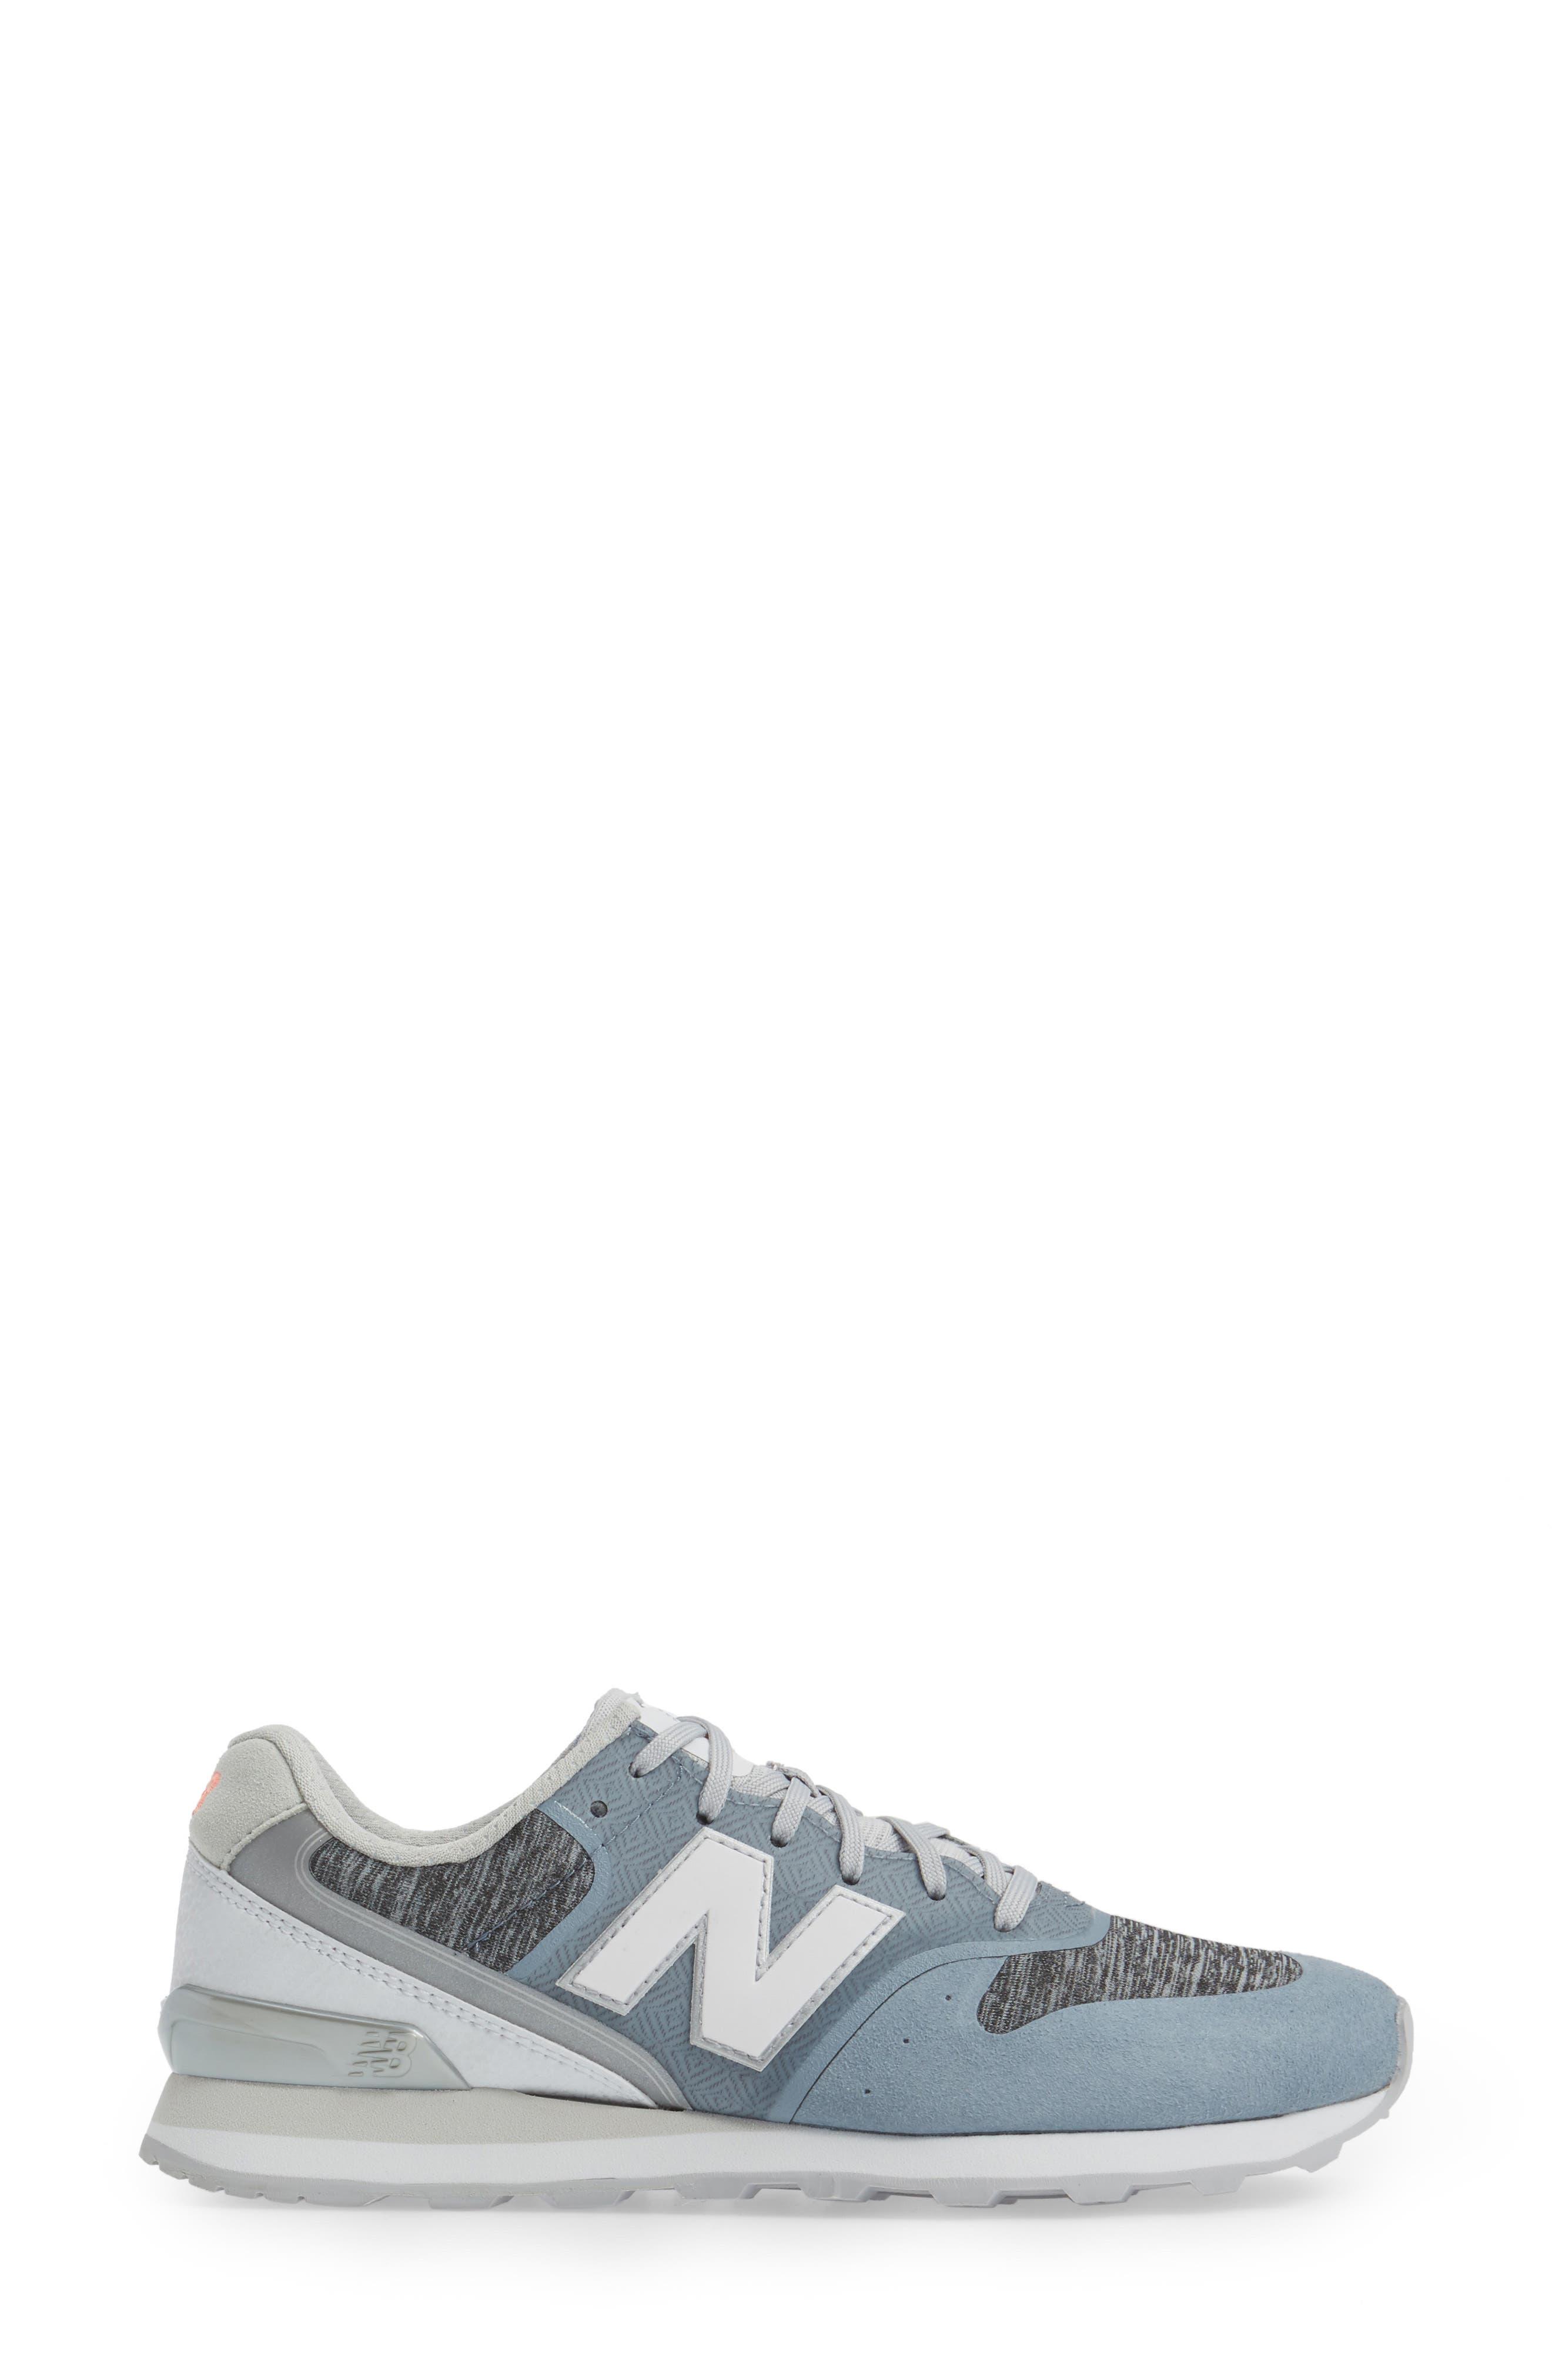 Alternate Image 3  - New Balance 696 Re-Engineered Sneaker (Women)